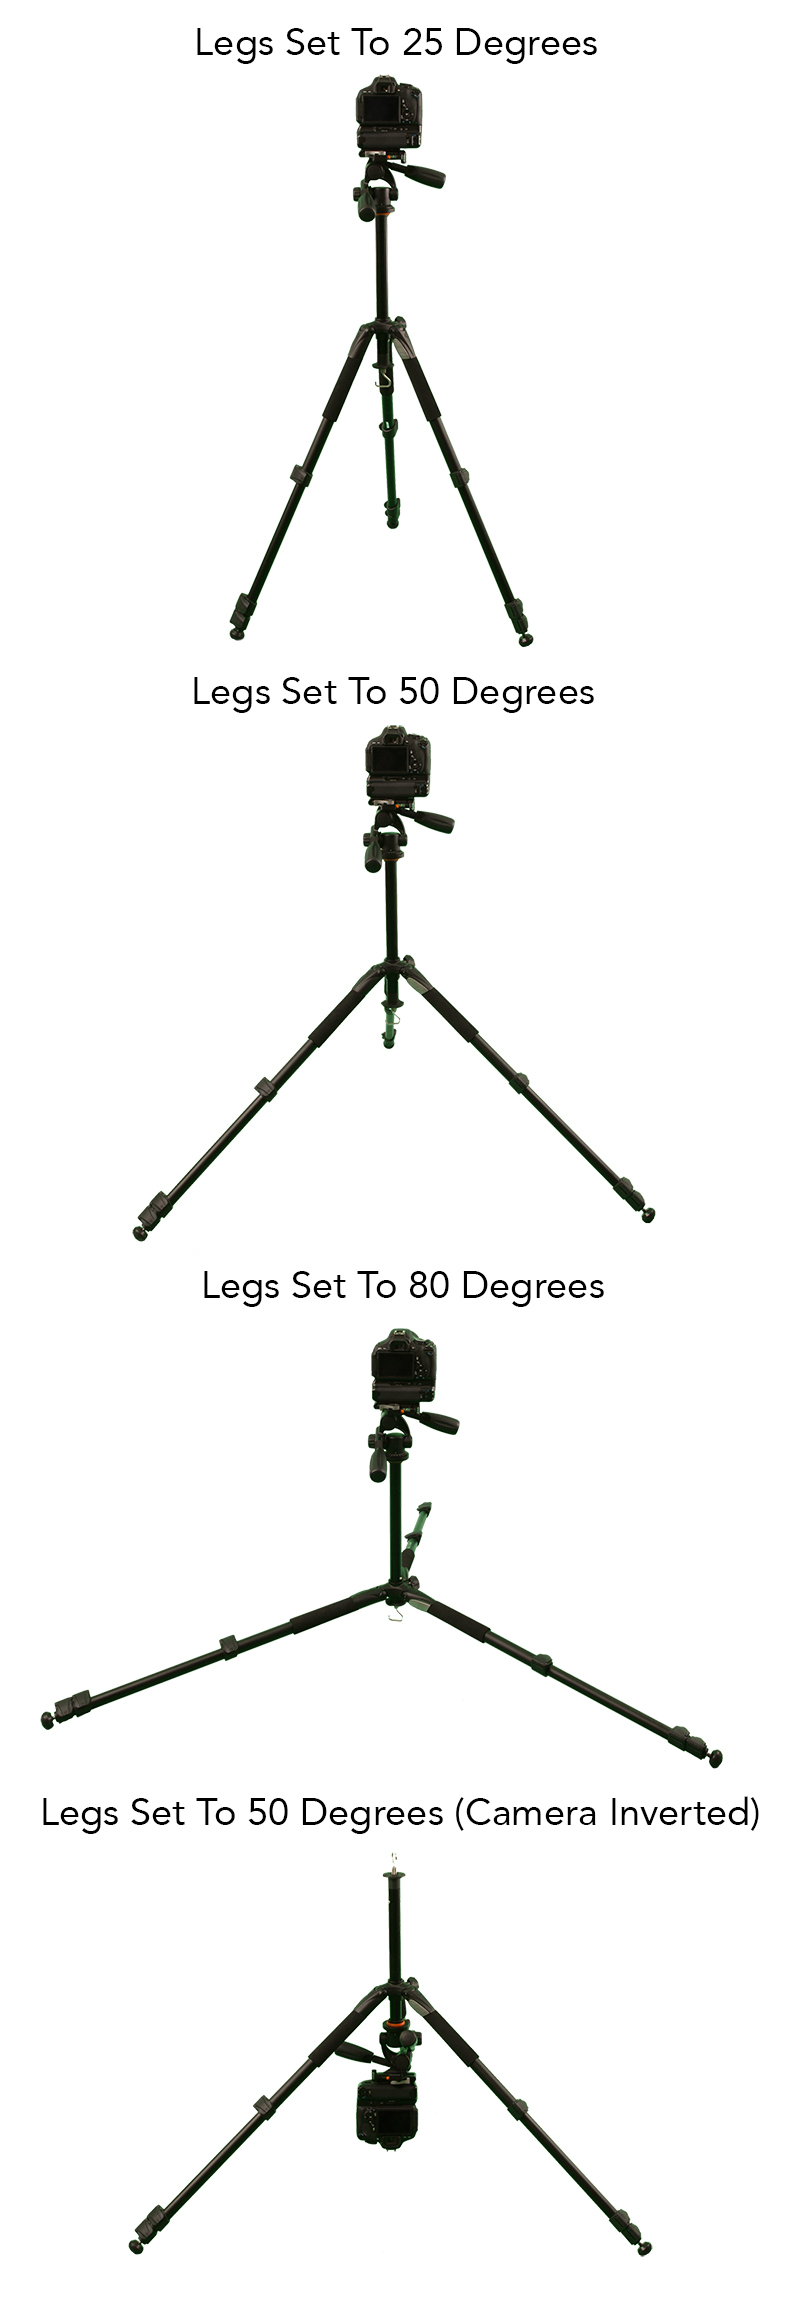 Legs-angles